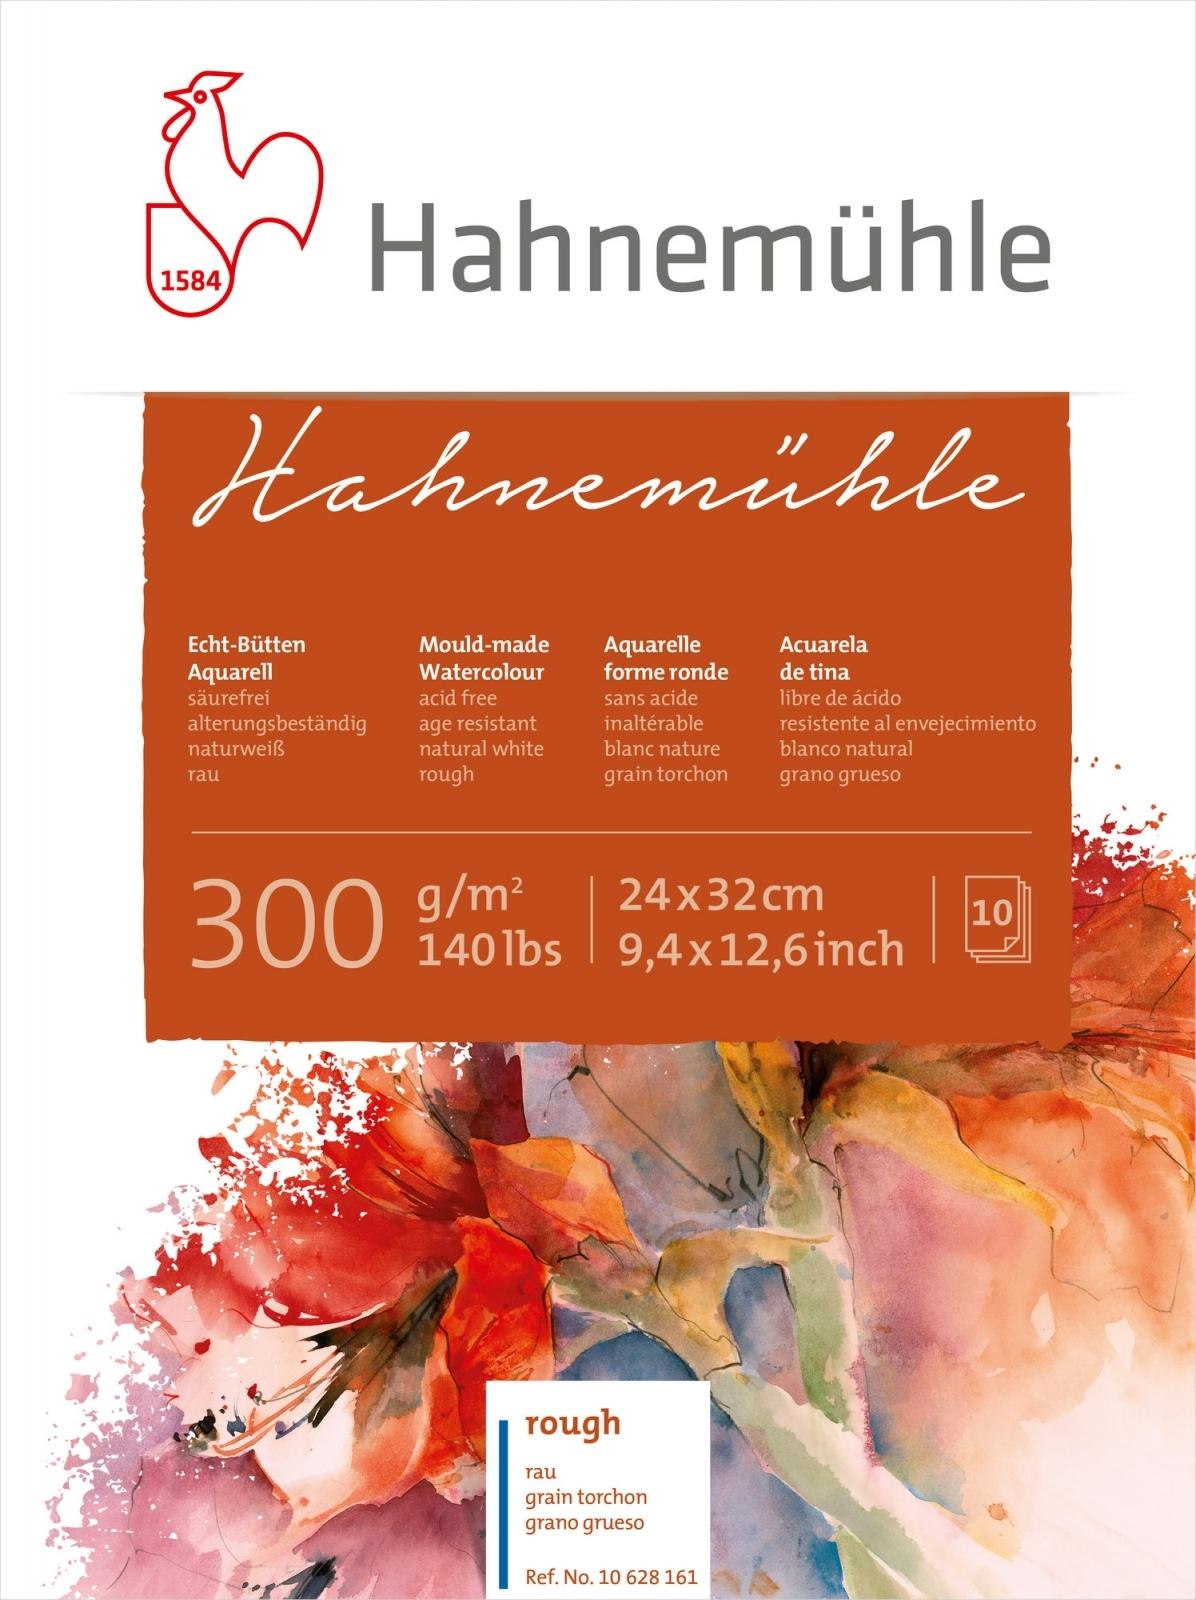 Papel Hahnemuhle Textura Rugosa 300g/m2 24x32 10fls (10628161) - Papelaria Botafogo